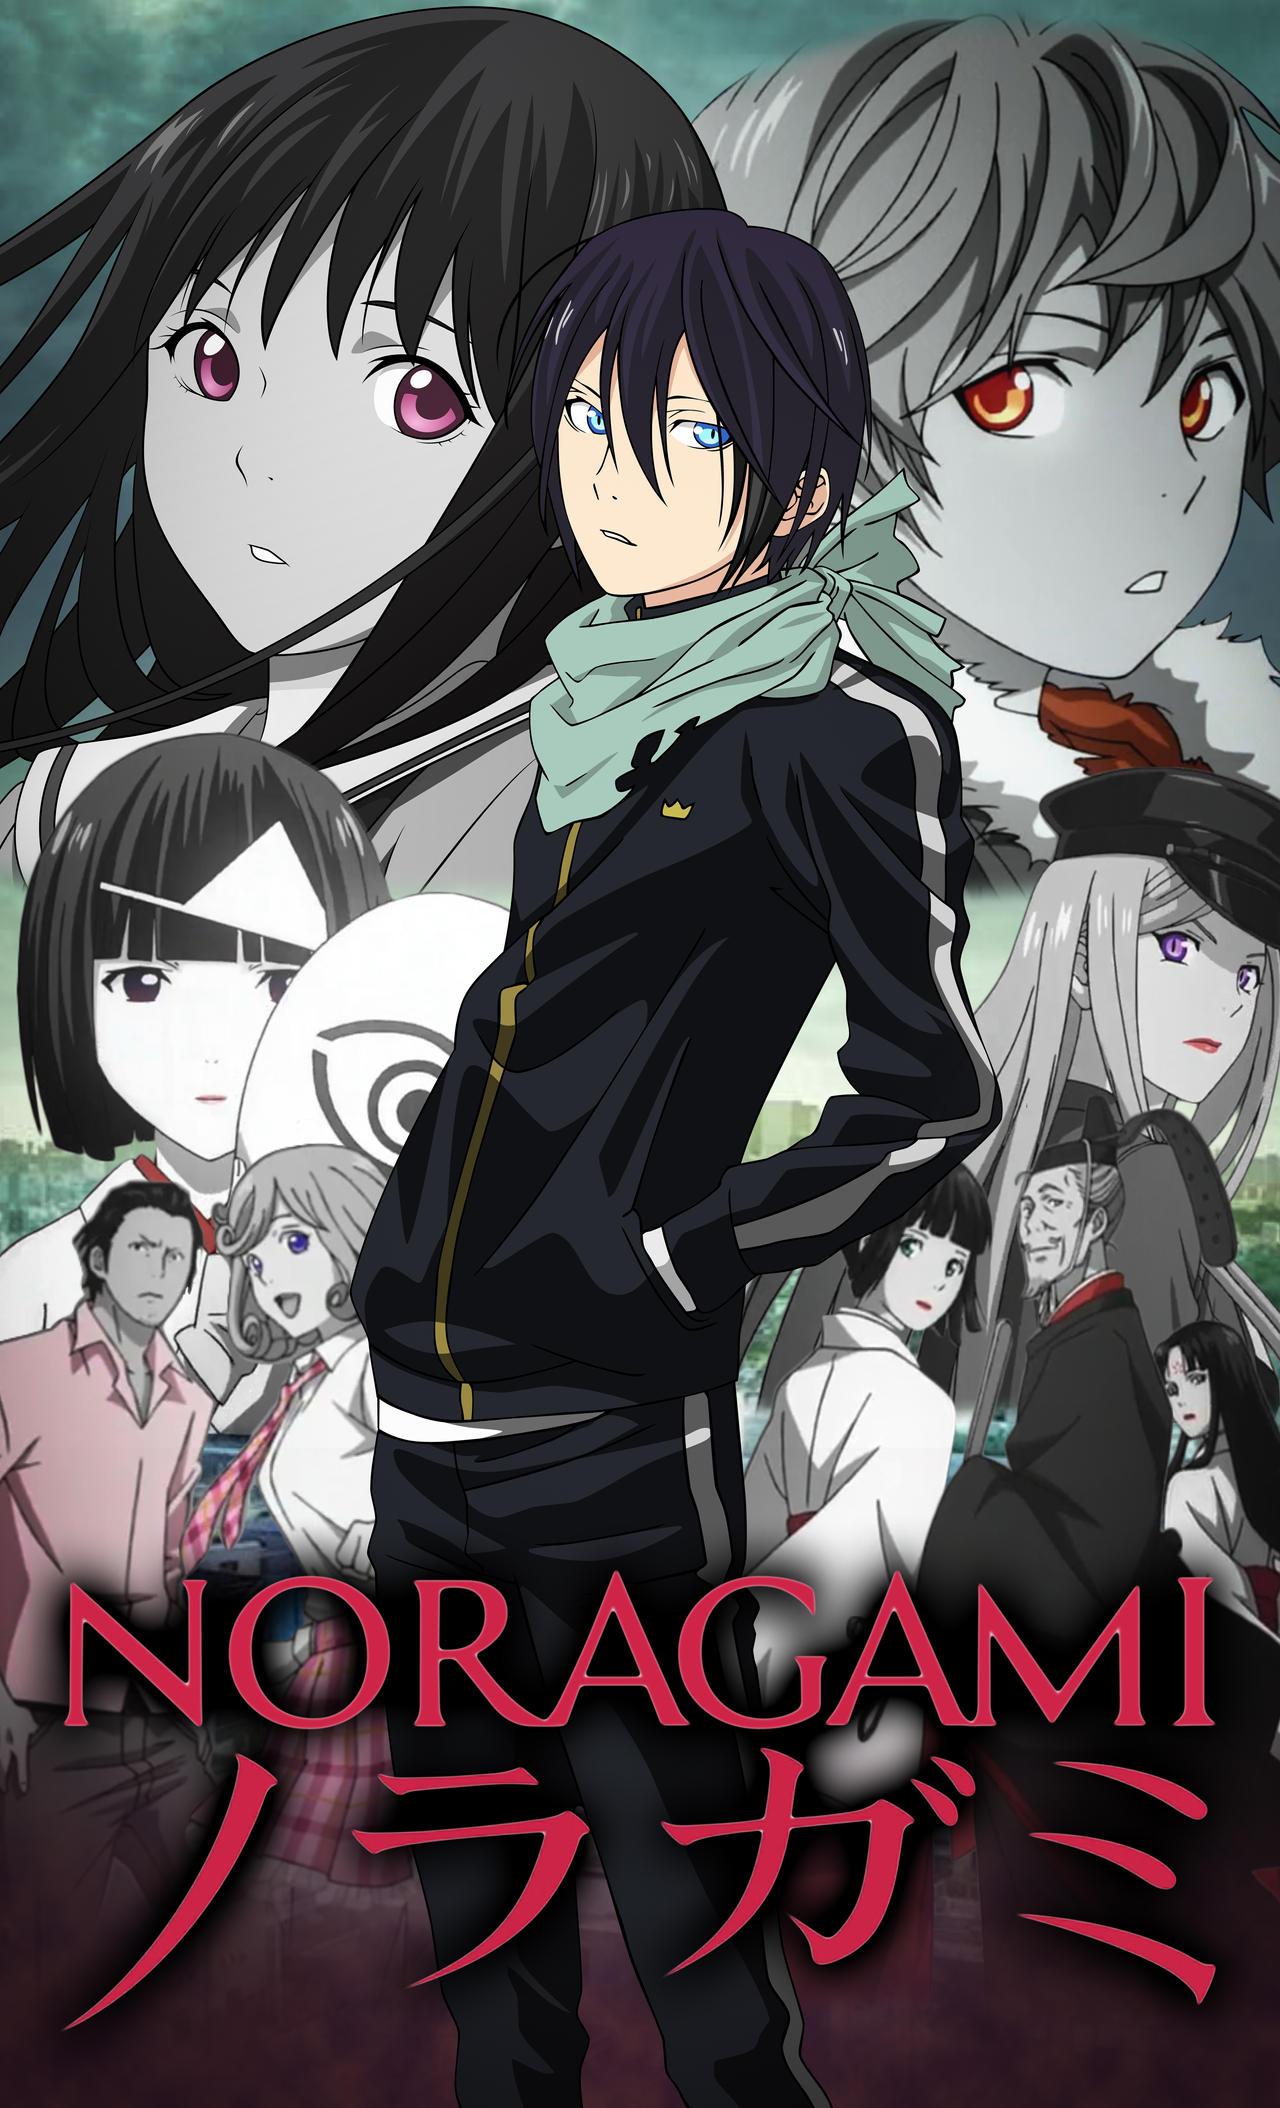 TensaZangetsu59 7 0 Noragami Poster By Jipjanus